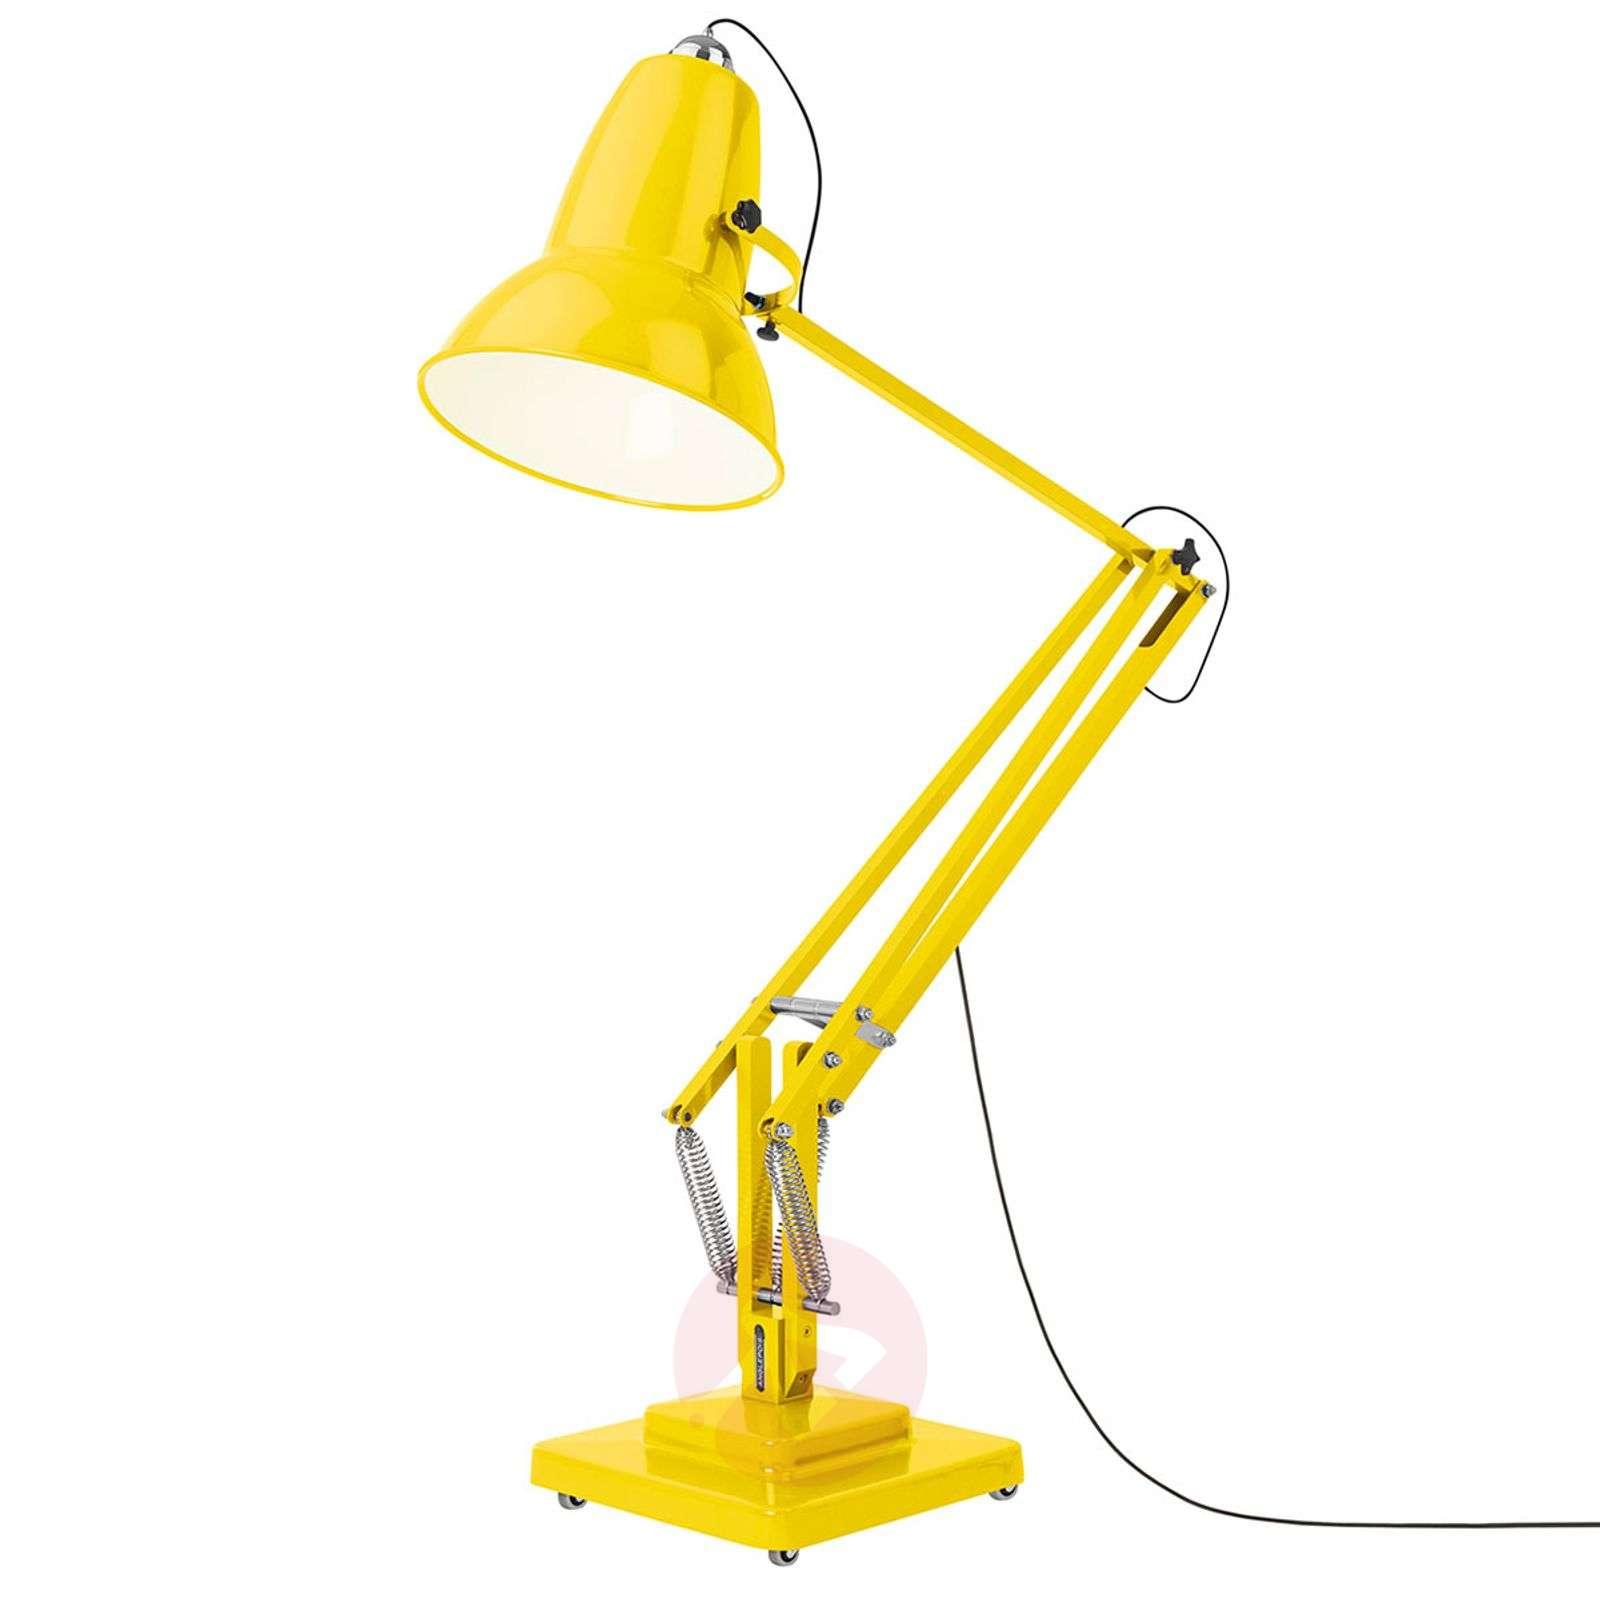 Anglepoise® Original 1227 Giant floor lamp-1073048X-01